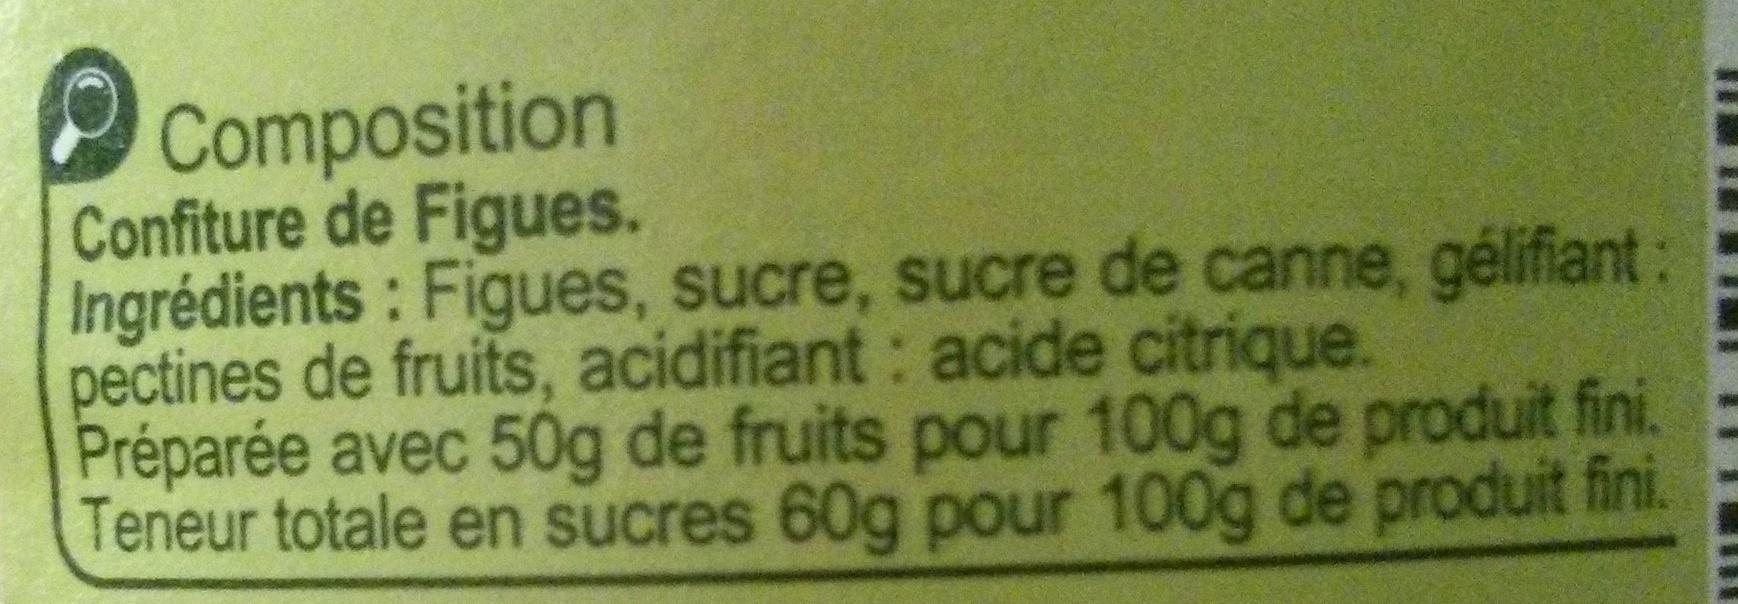 Confiture Figues - Ingredients - fr